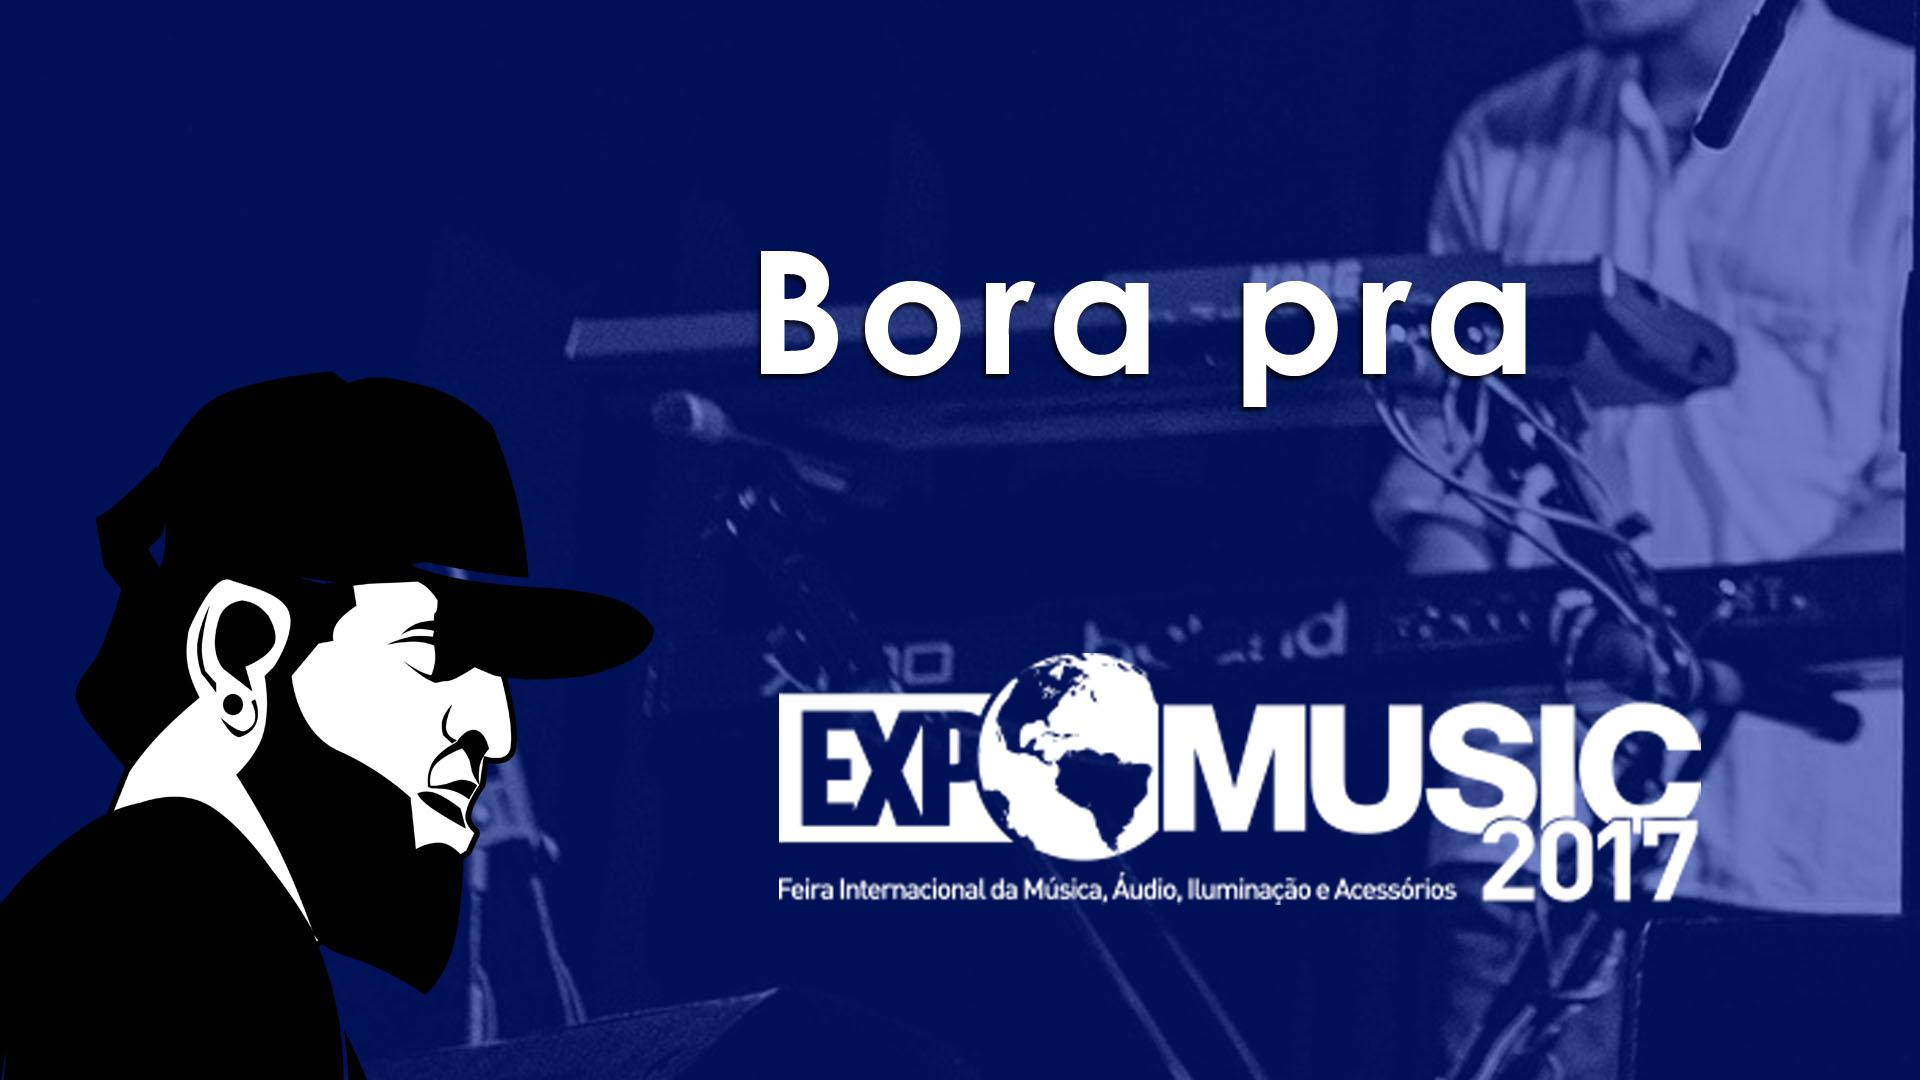 Bora Pra EXPOMUSIC 2017?